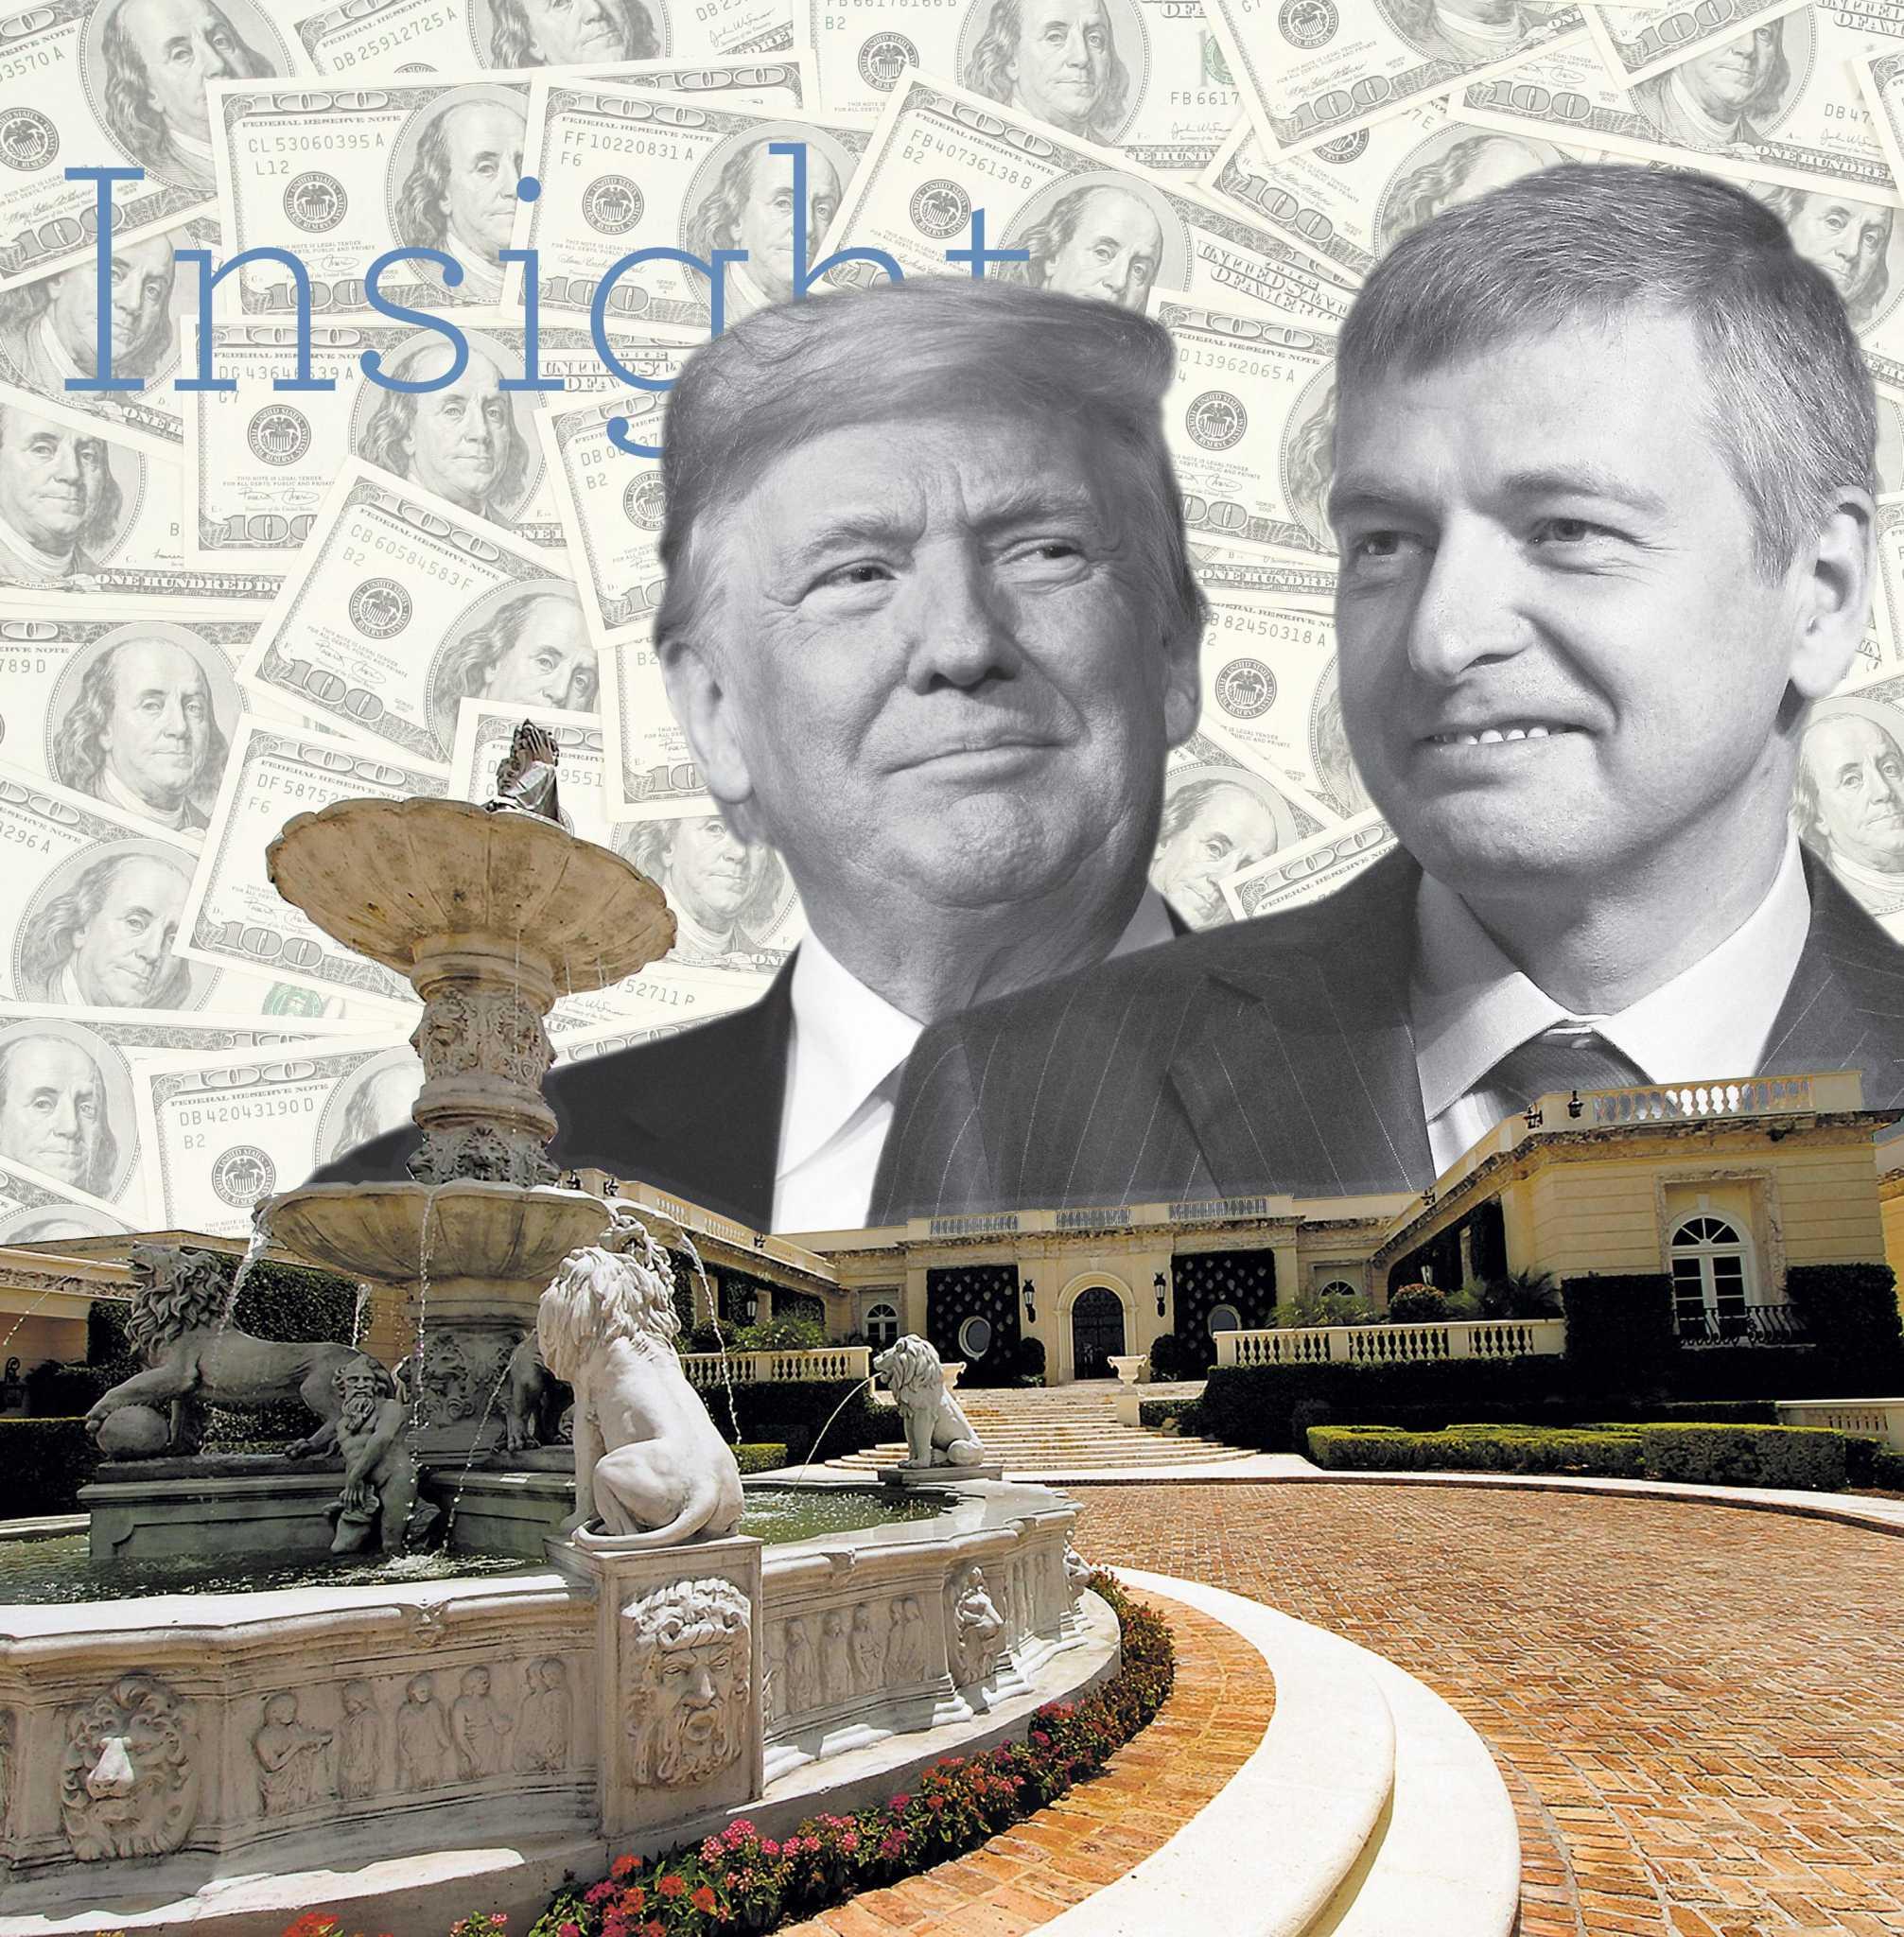 Current Status: Strange real estate deal raises specter of Putin buying Trump